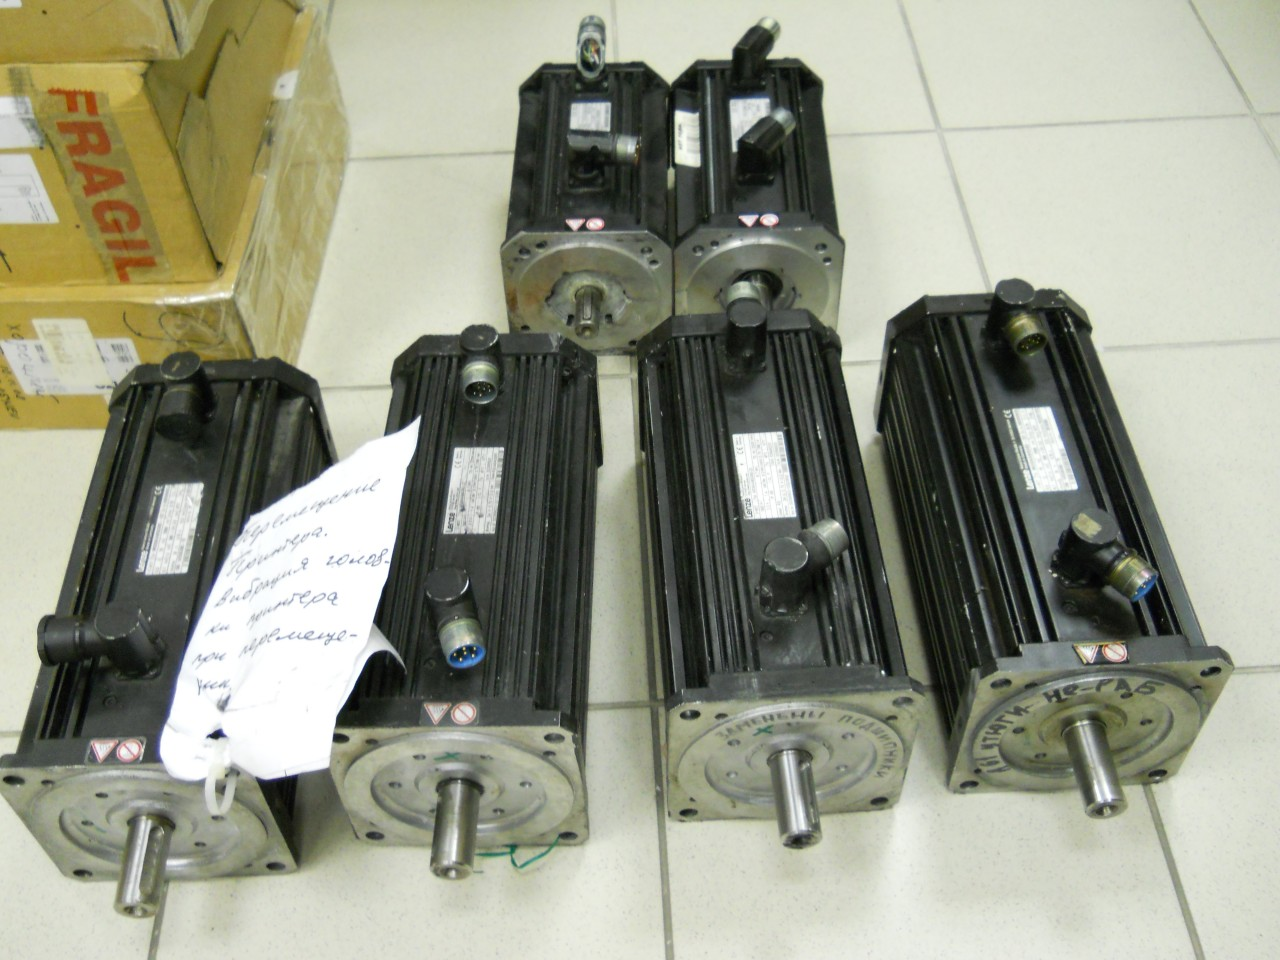 Ремонт Lenze EVS E94 93 94 EVD EL CPC MCS ECS EVF E84A E82 MH4 ESV SMD TMD сервопривод серводвигатель